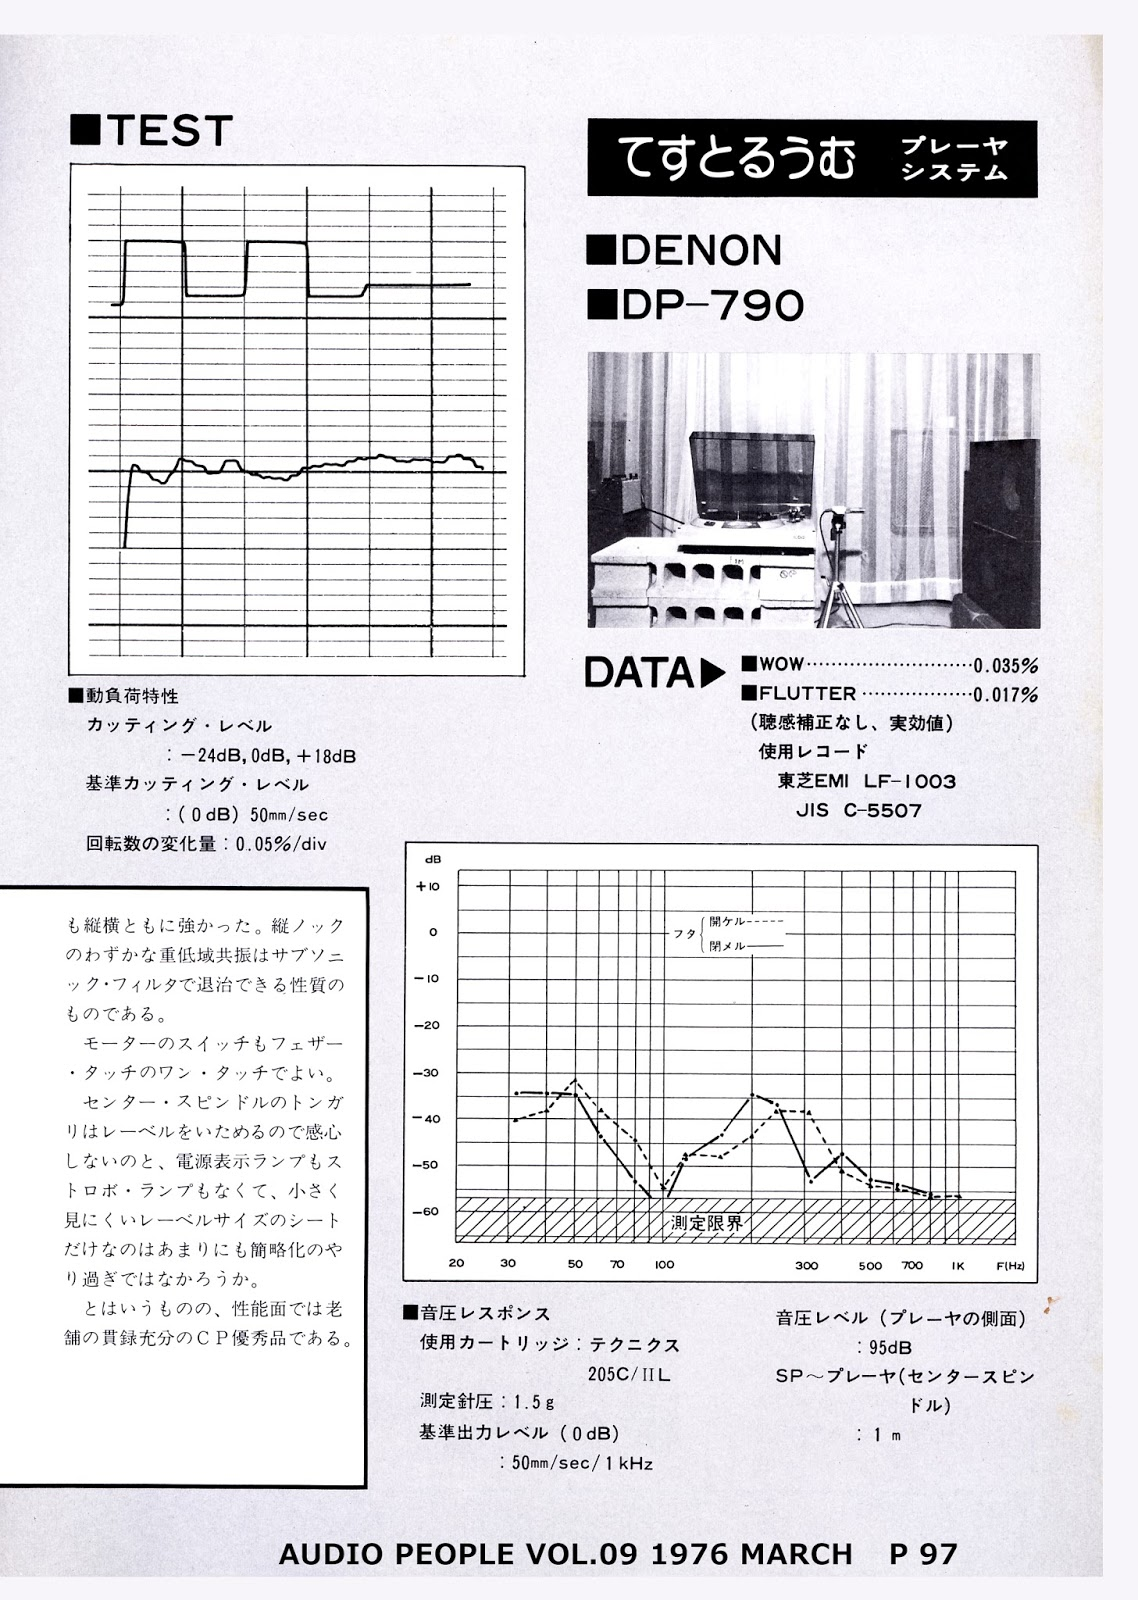 world of SL-1200, column: オーディオピープル vol.9 DP-790 テスト